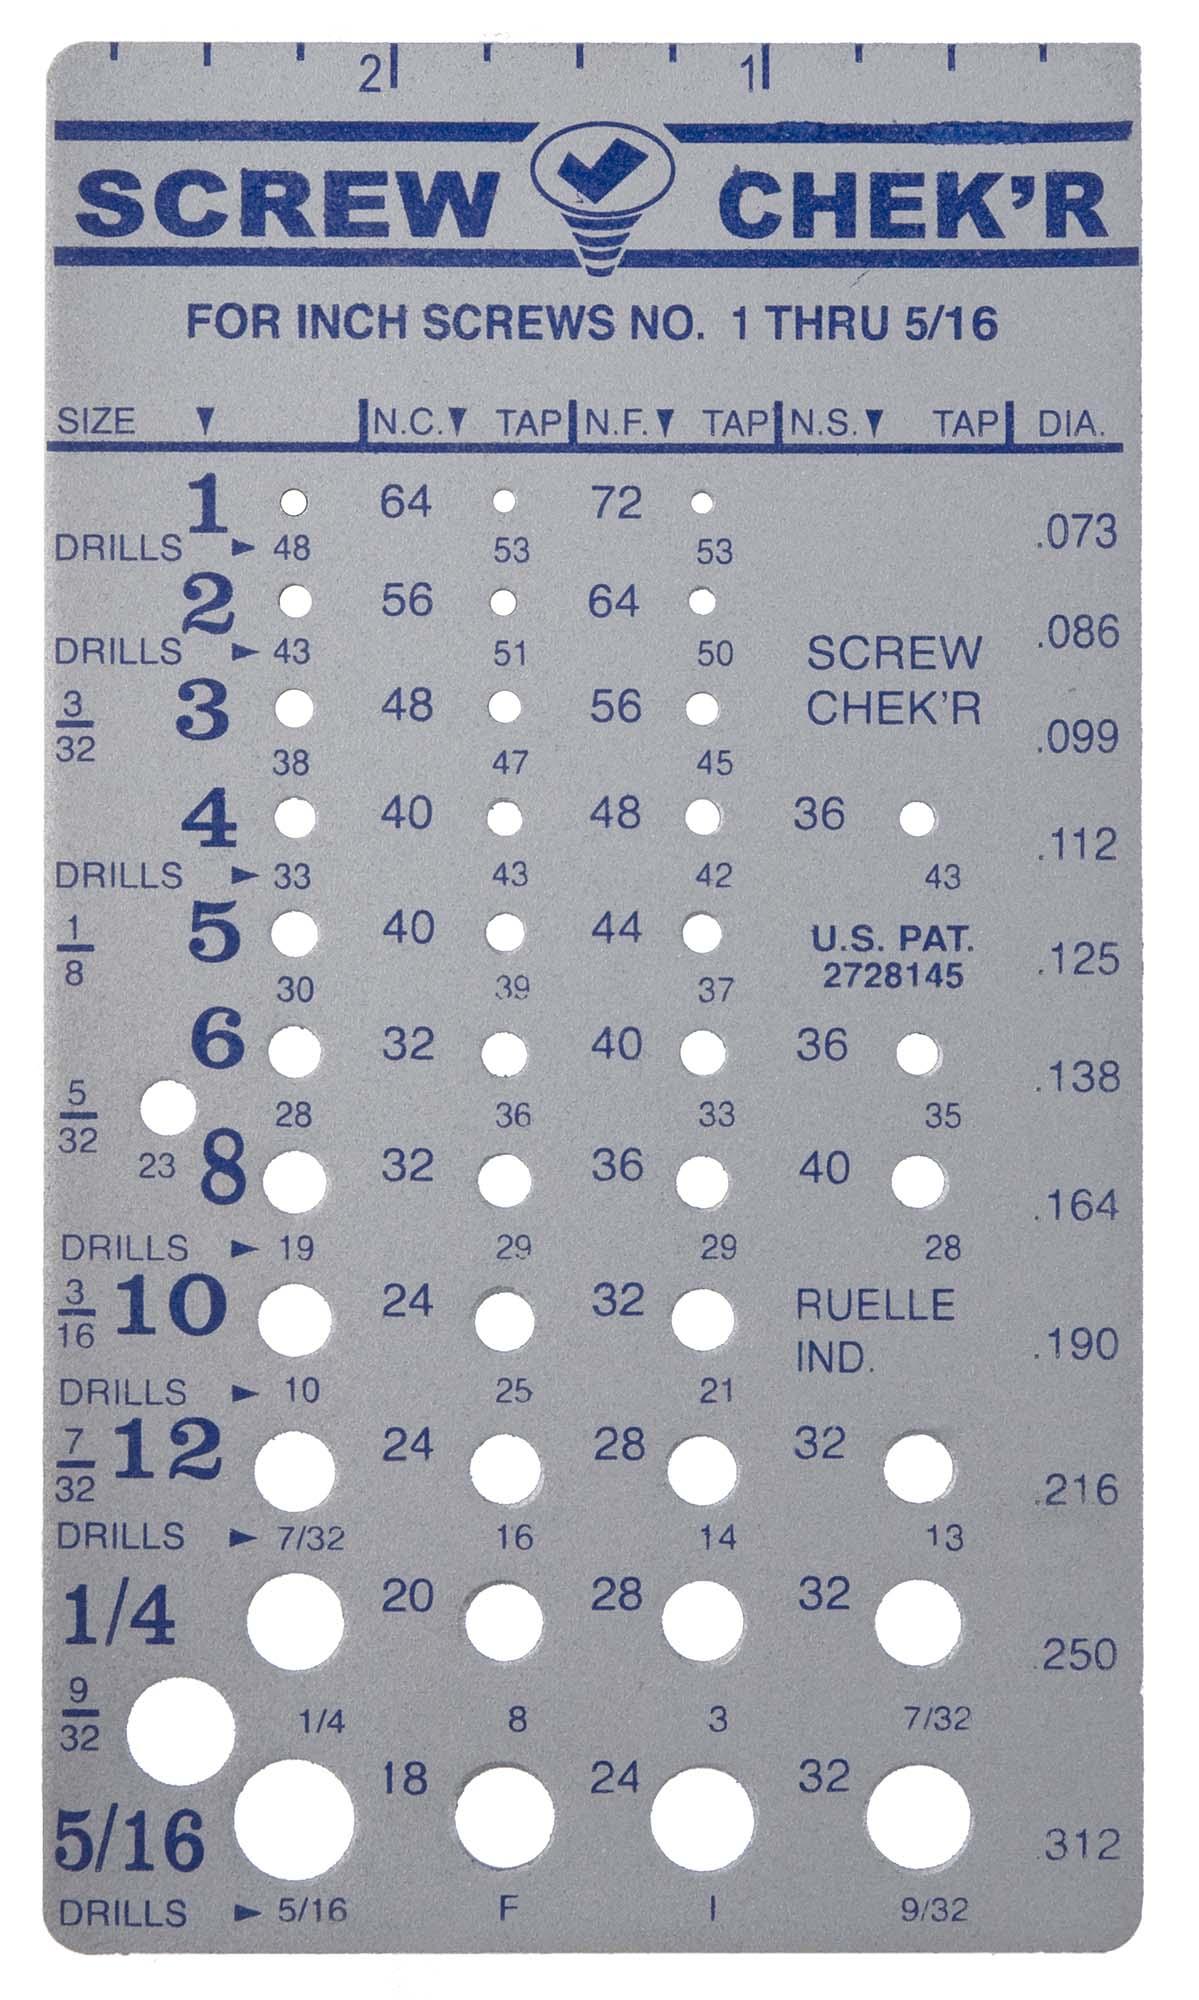 "#1 thru 5/16"" Screw Checker"